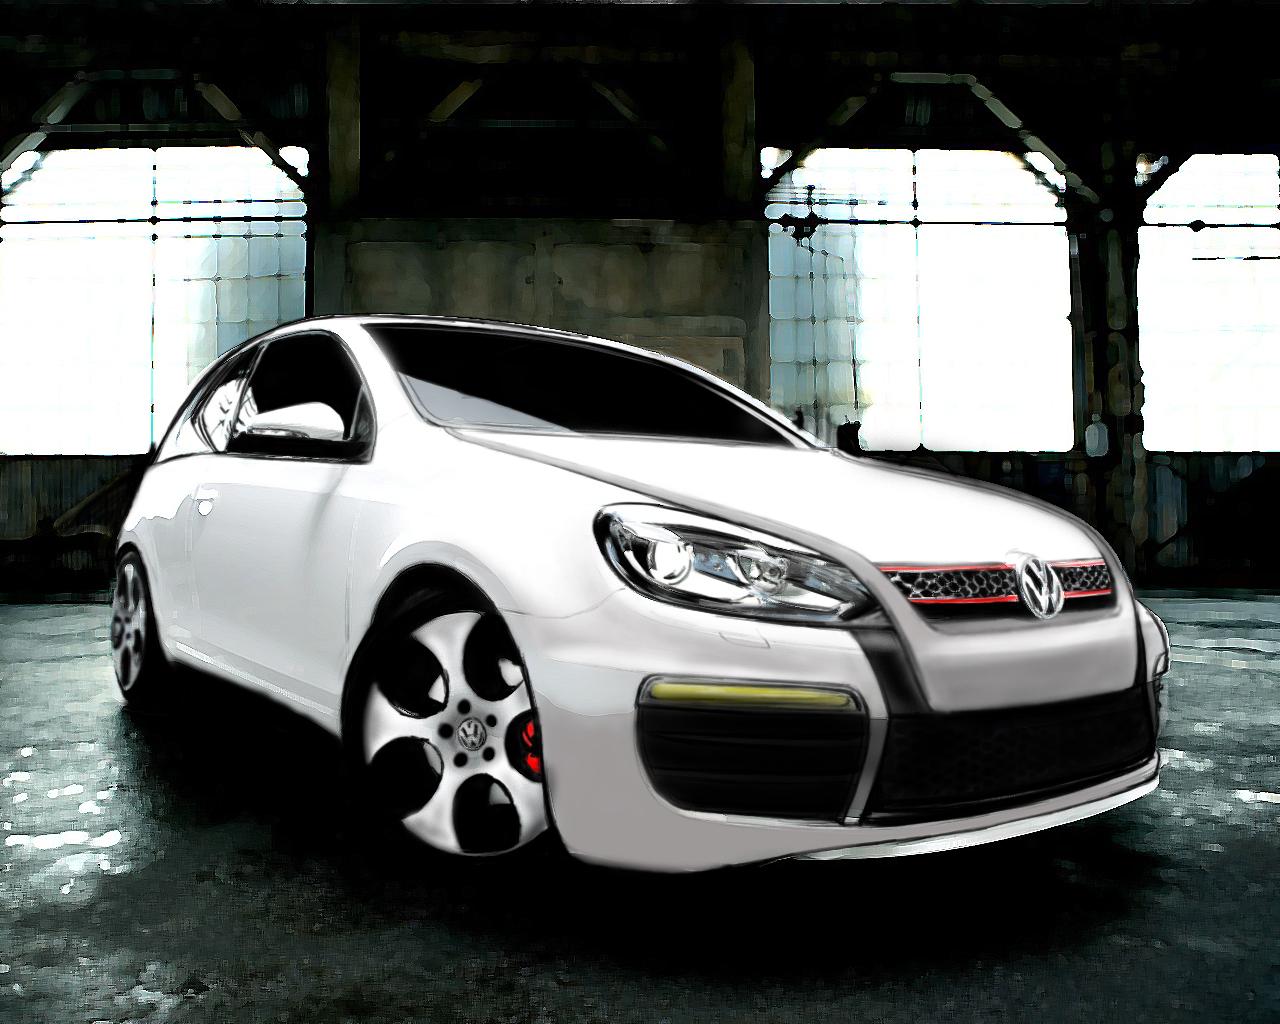 http://4.bp.blogspot.com/-kVC3Xj_pSc0/TyDlX6dyPvI/AAAAAAAAAzc/SgZUzIgDe64/s1600/703-cars_vw_golf_gti_mk6_wallpaper+copia.jpg